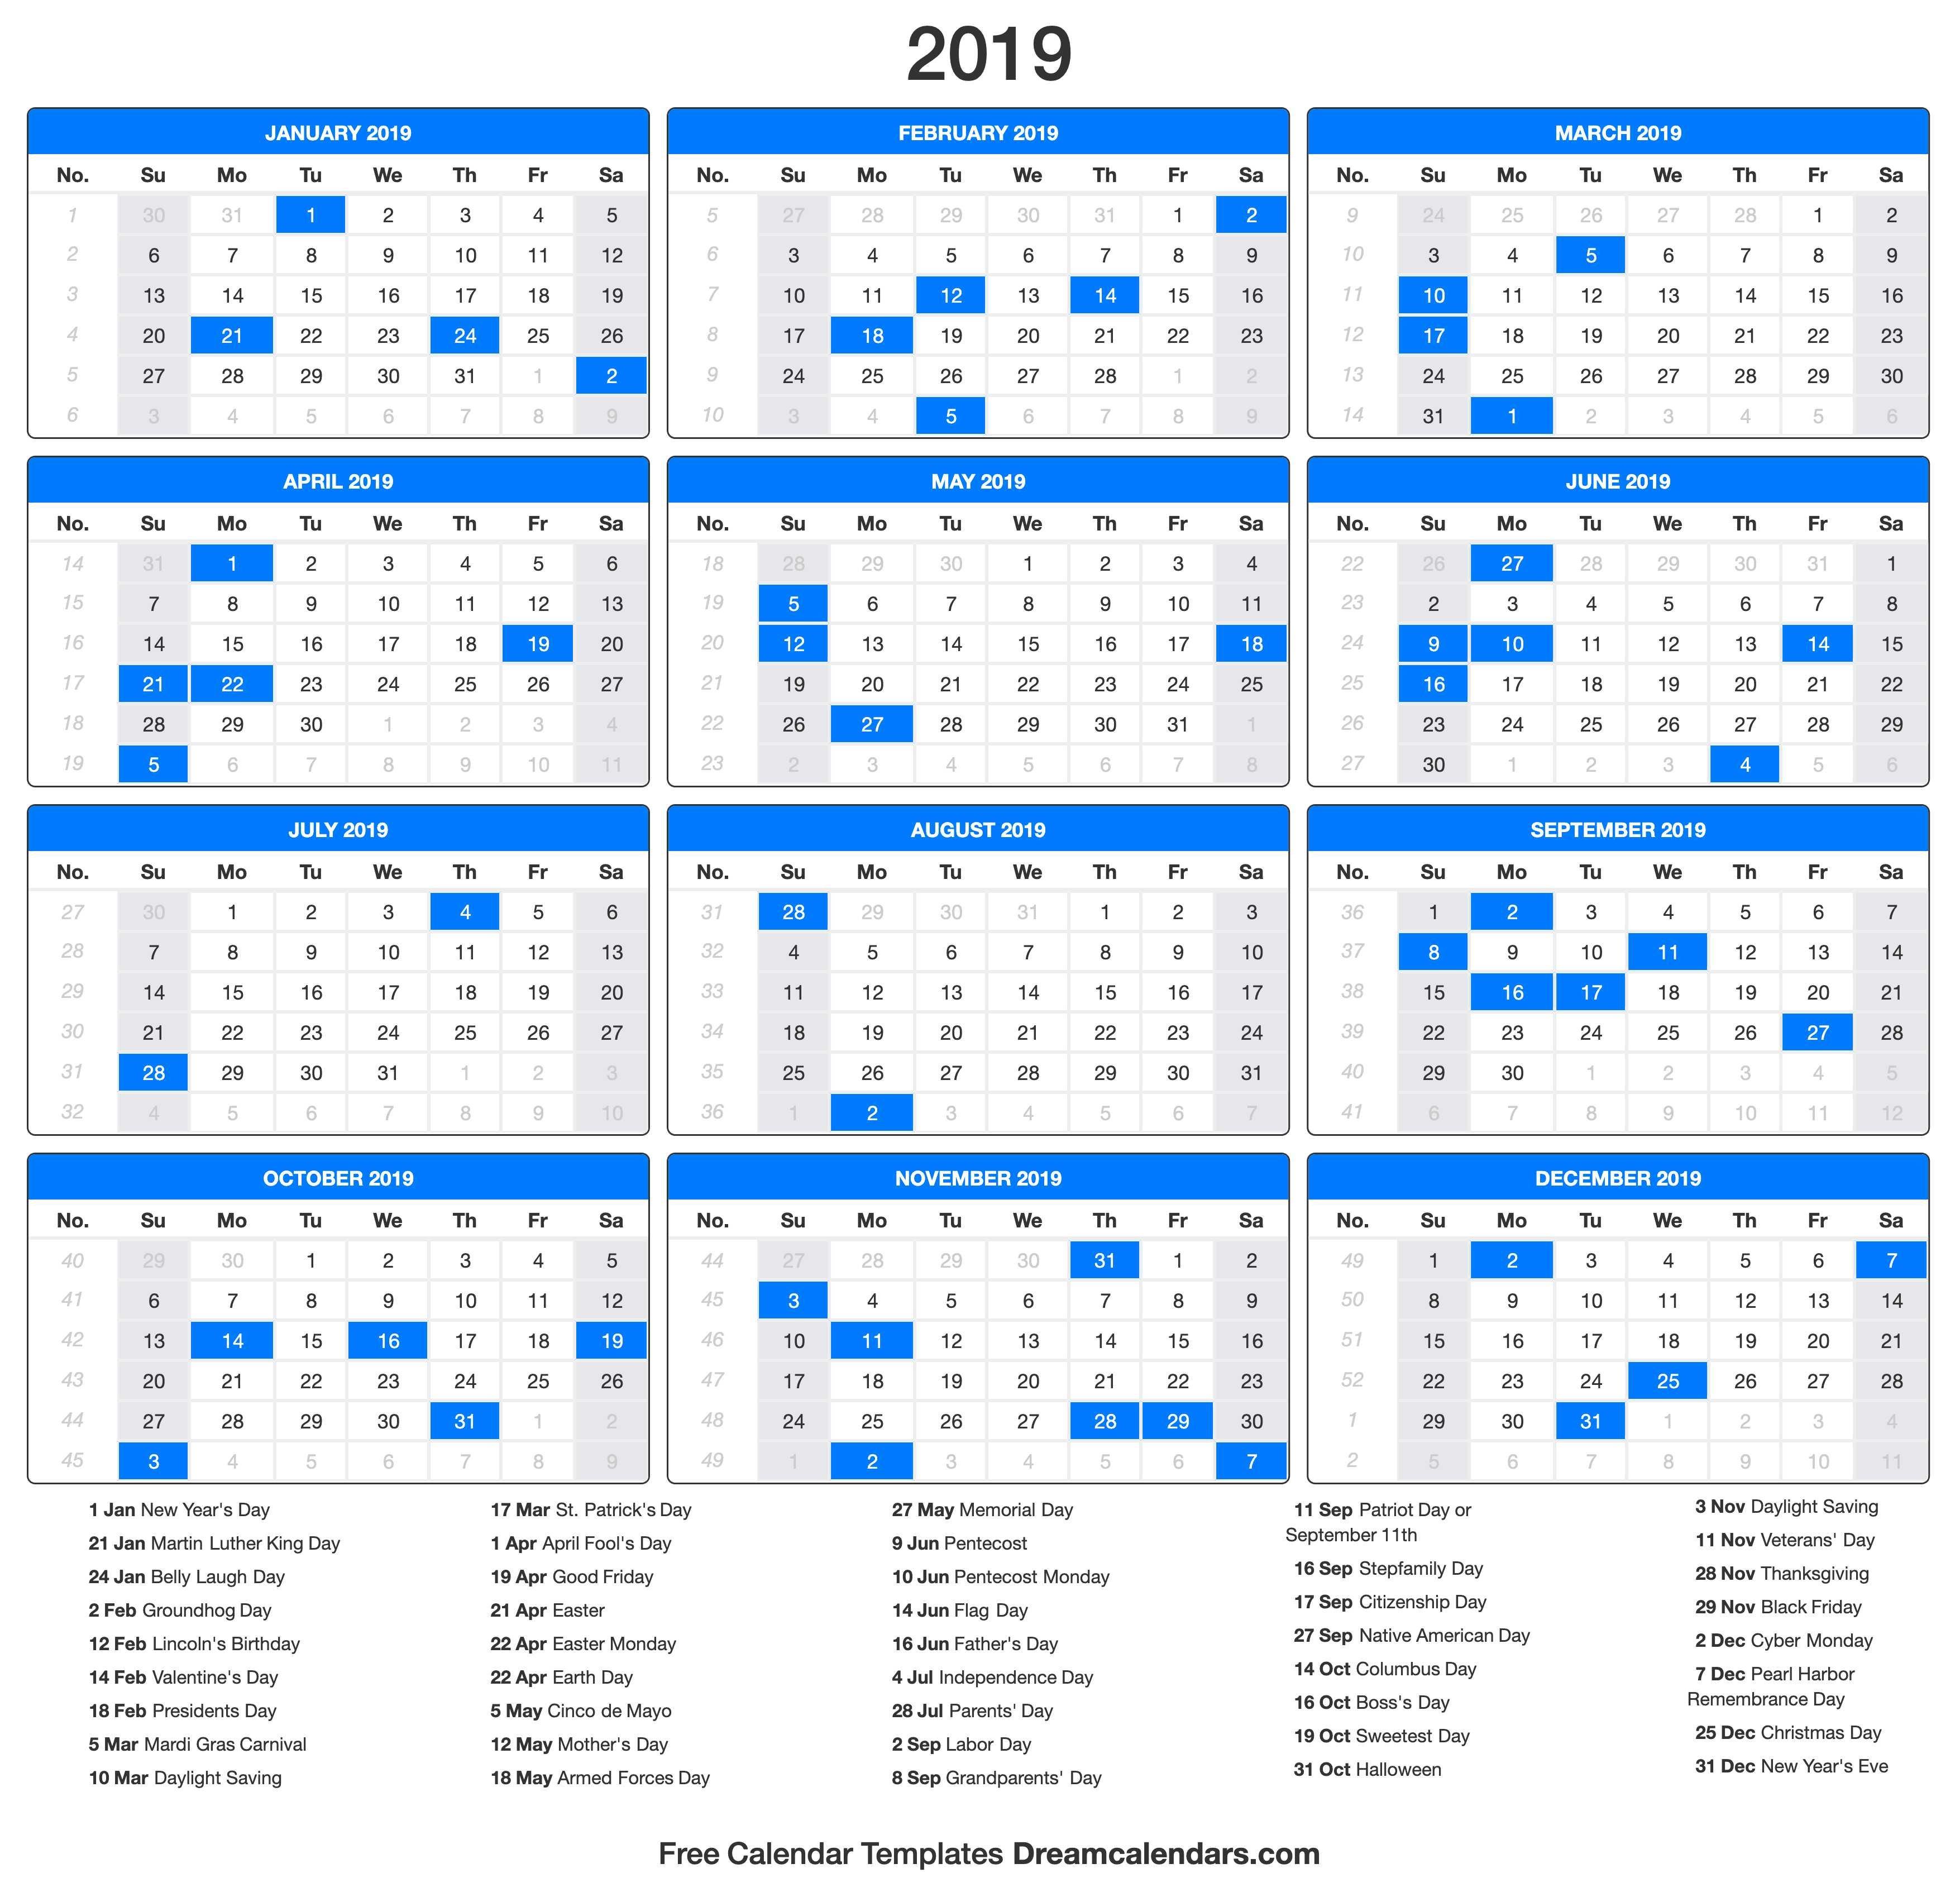 Printable 2019 Calendar – Dream Calendars Calendar 2019 Presidents Day